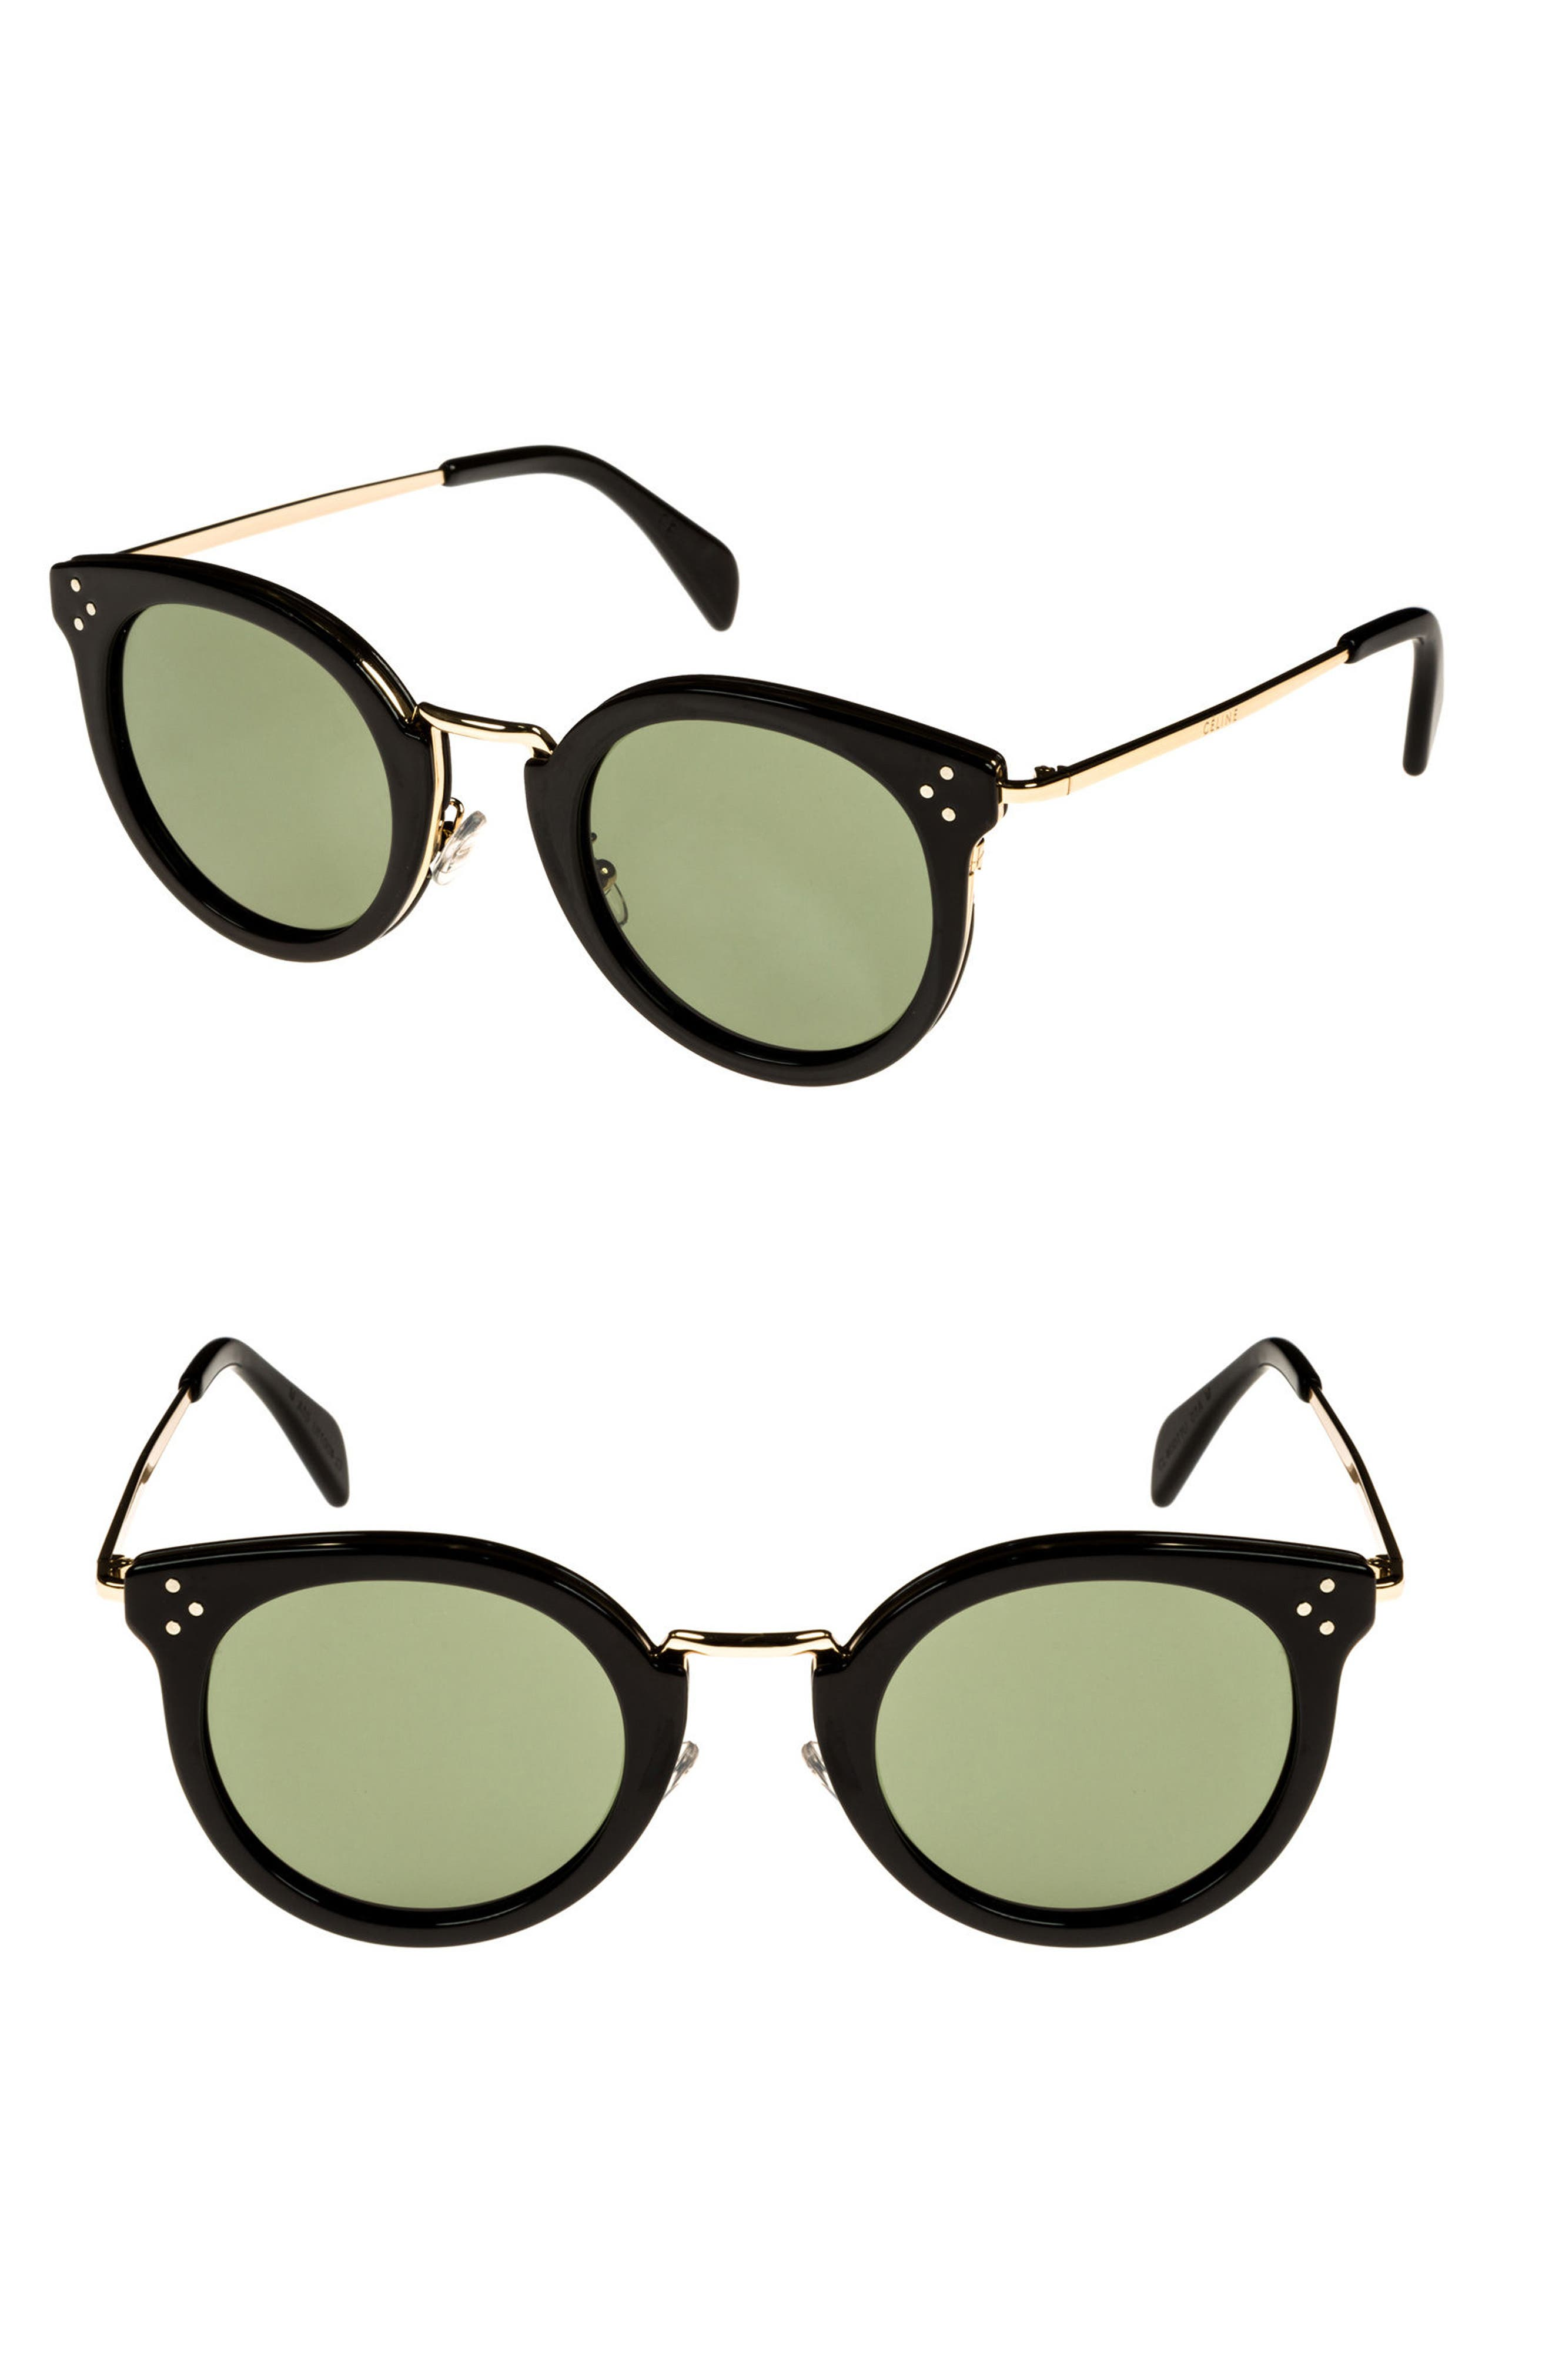 49mm Round Sunglasses,                             Main thumbnail 1, color,                             BLACK/ PALE GOLD/ SMOKE